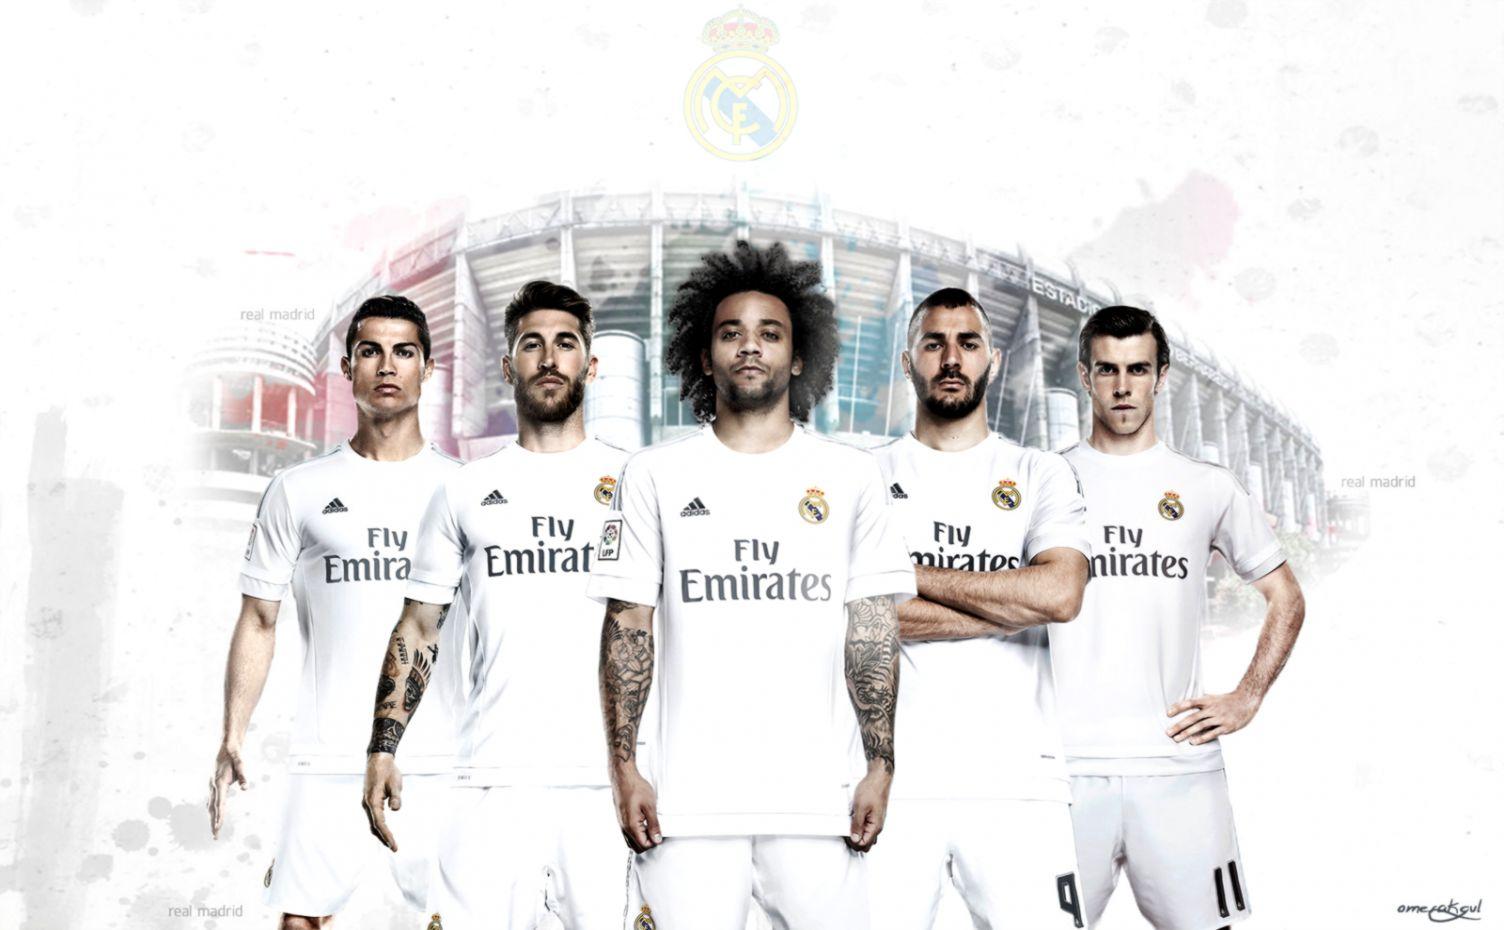 Real Madrid Team Squad 2015 Wallpaper Hd Wallpapers Sinaga